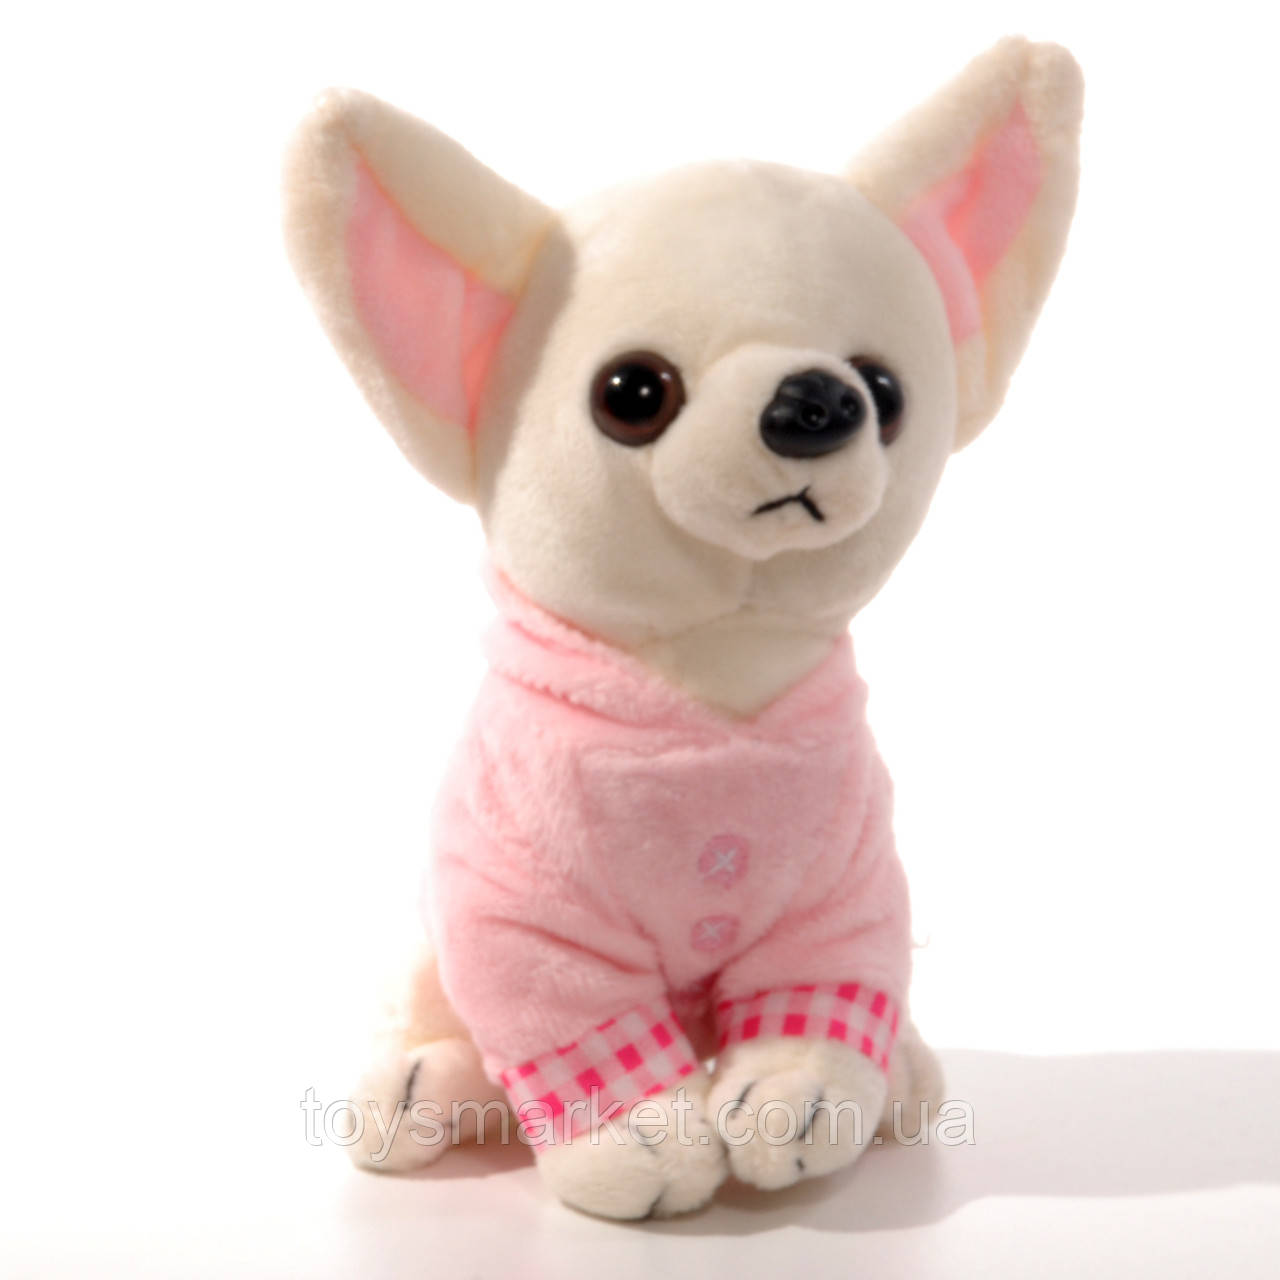 Мягкая игрушка собака Чи Чи Лав